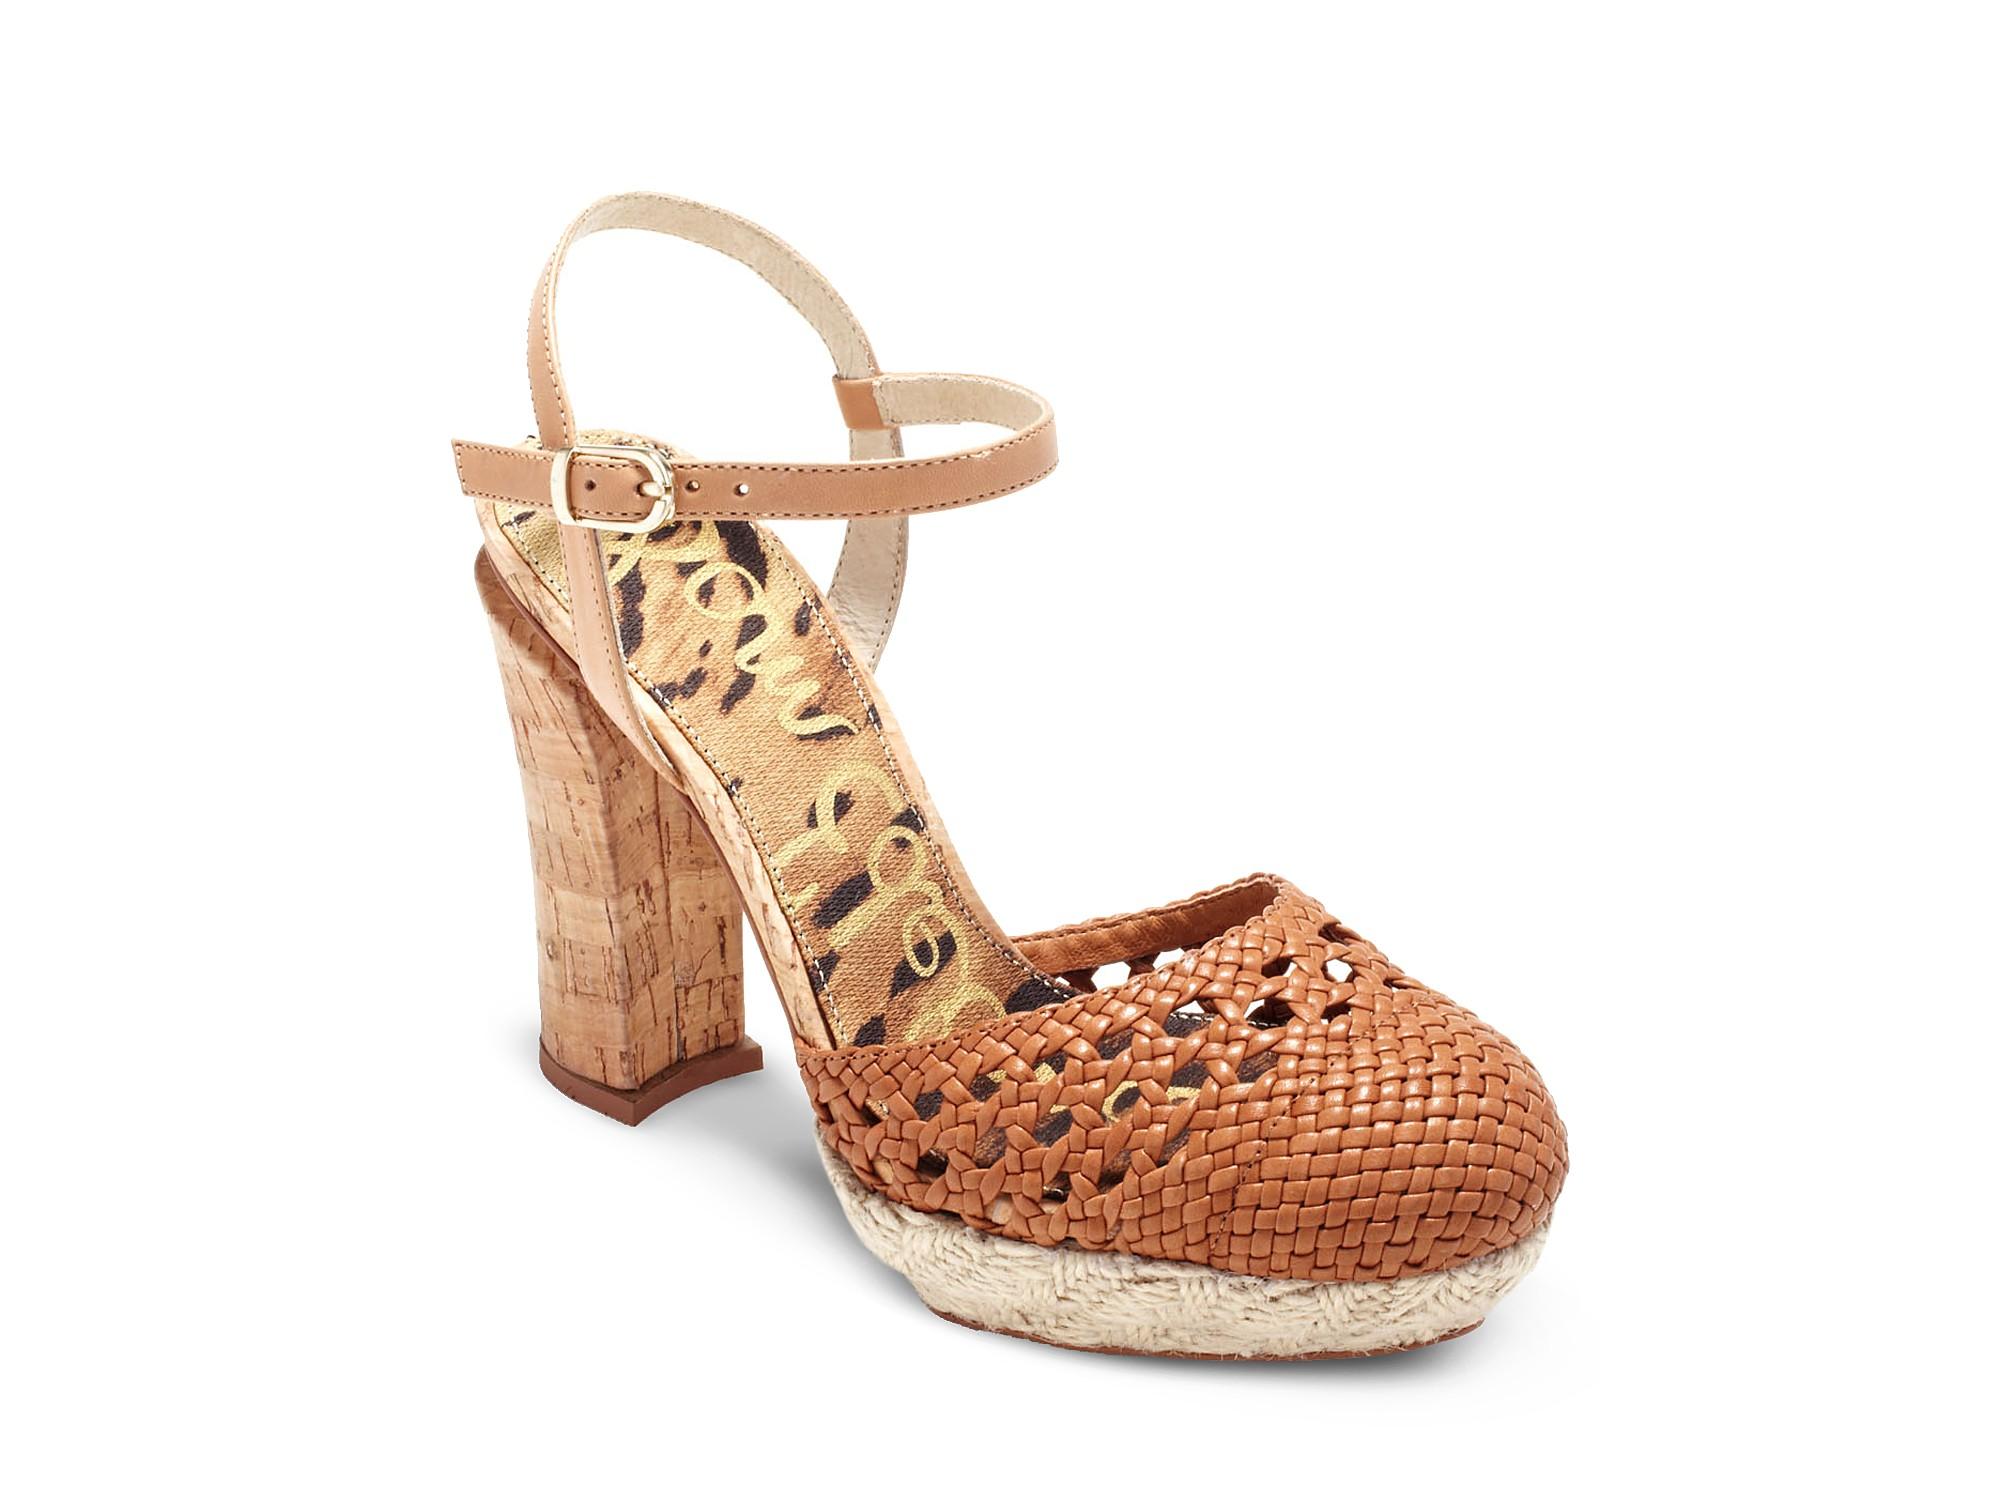 0ba1b1ef5f6e Lyst - Sam Edelman Rella Chunky Heel Closed Toe Sandals in Black